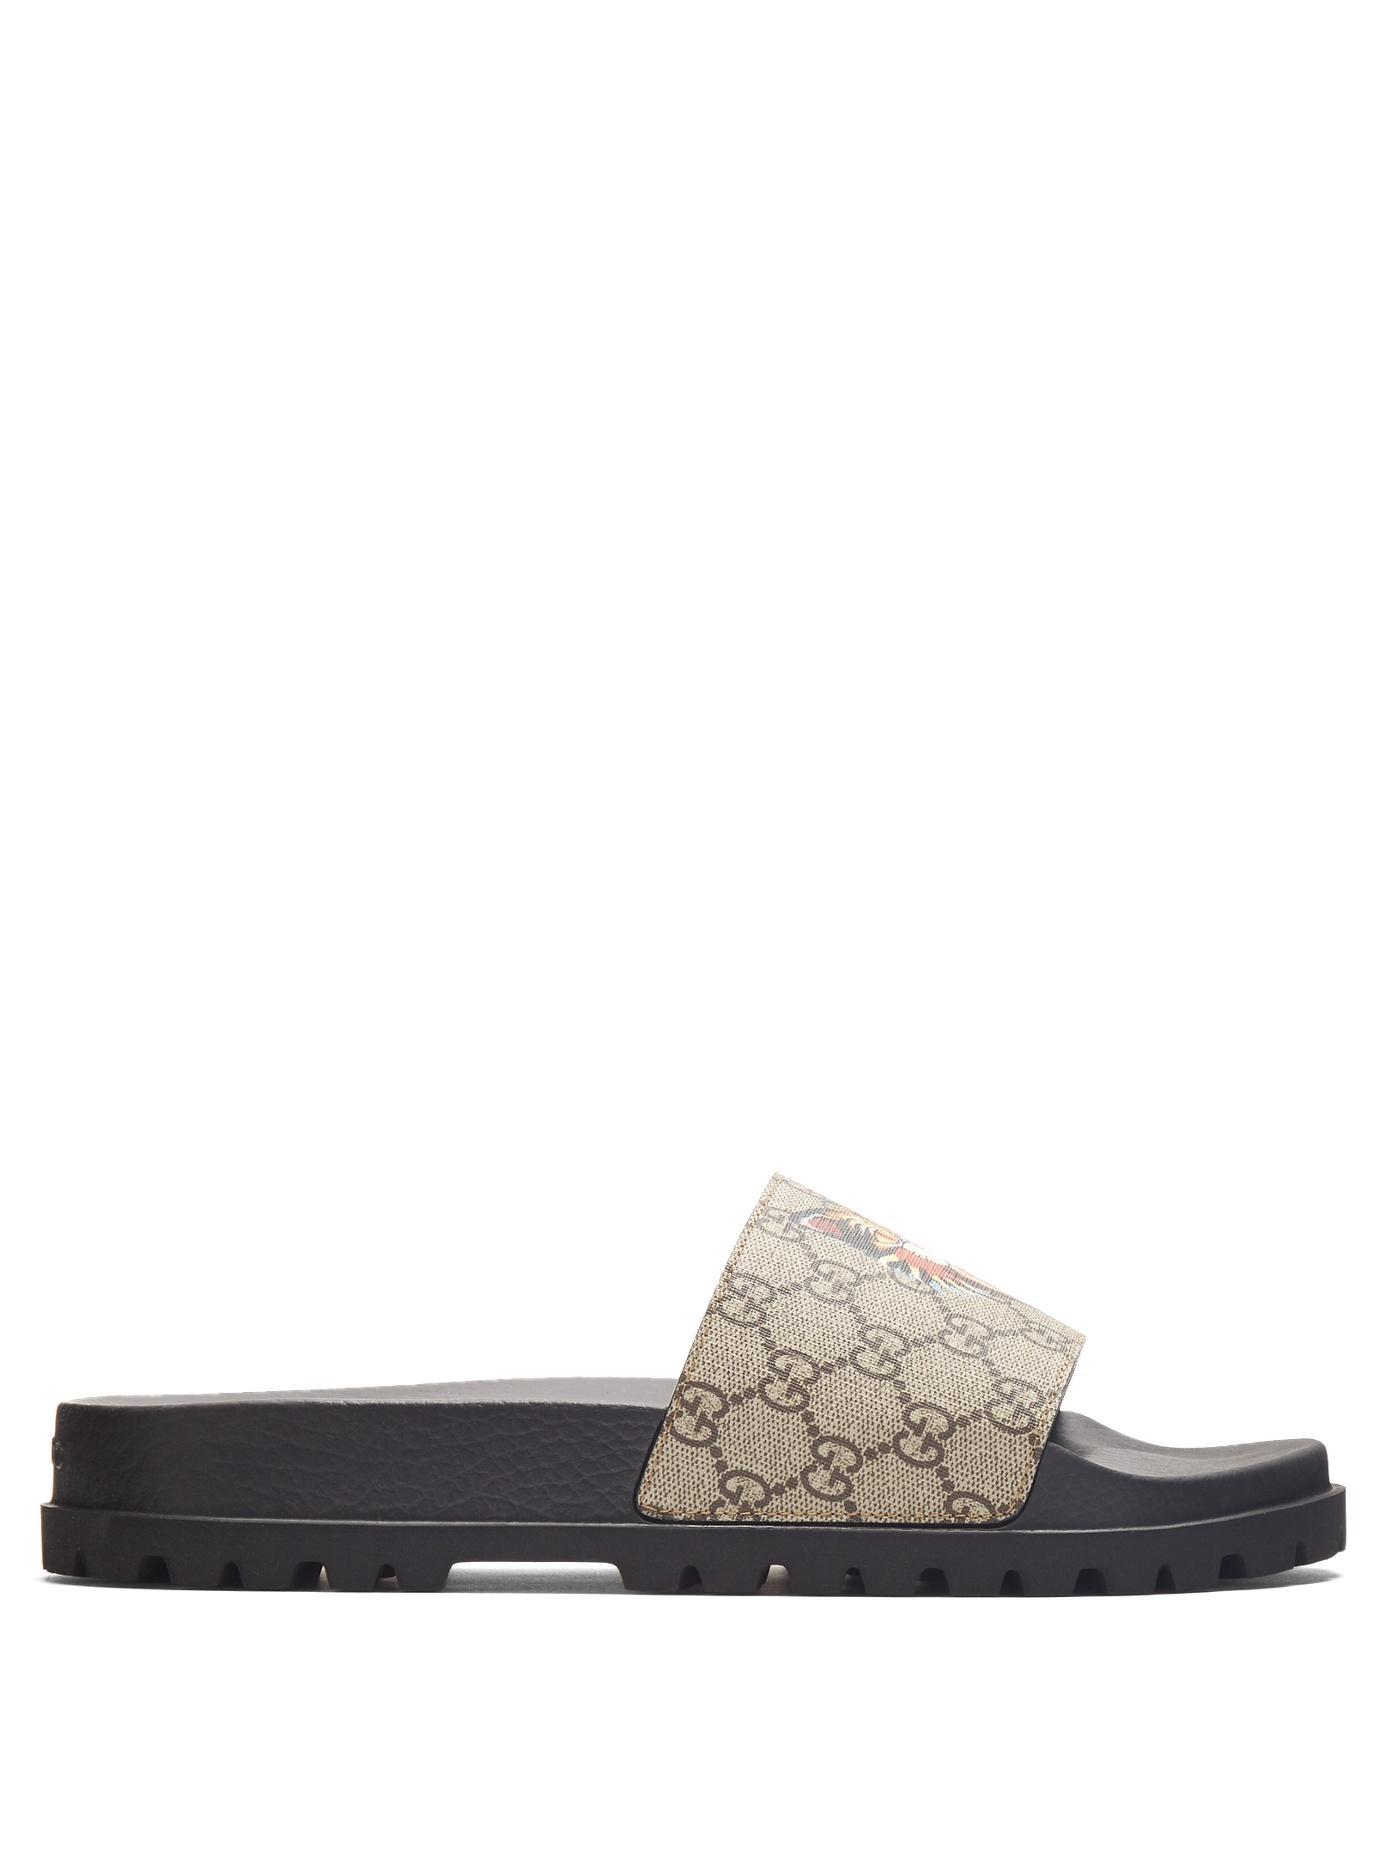 d7fca31c2 Gucci Pursuit Treck Gg Supreme Cat & Eye Slide Sandal, Multicolor In Brown